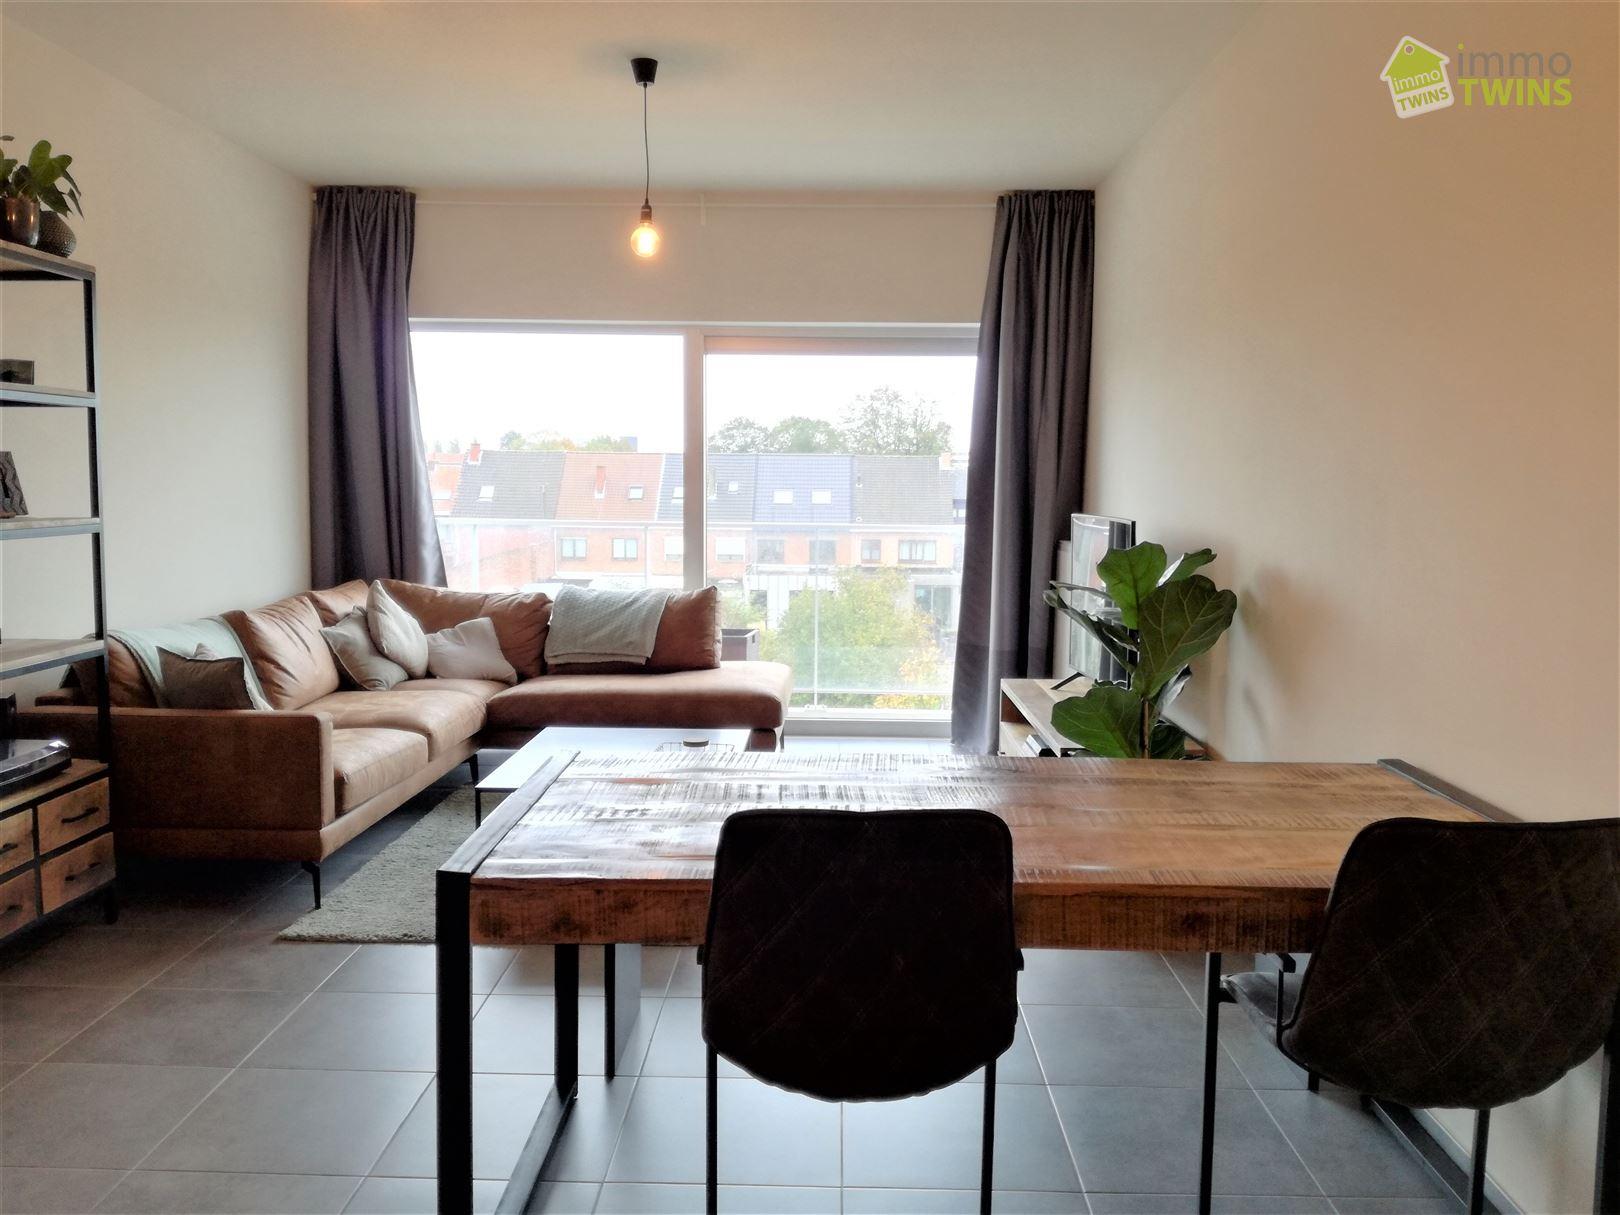 Foto 5 : Appartement te 9160 LOKEREN (België) - Prijs € 750